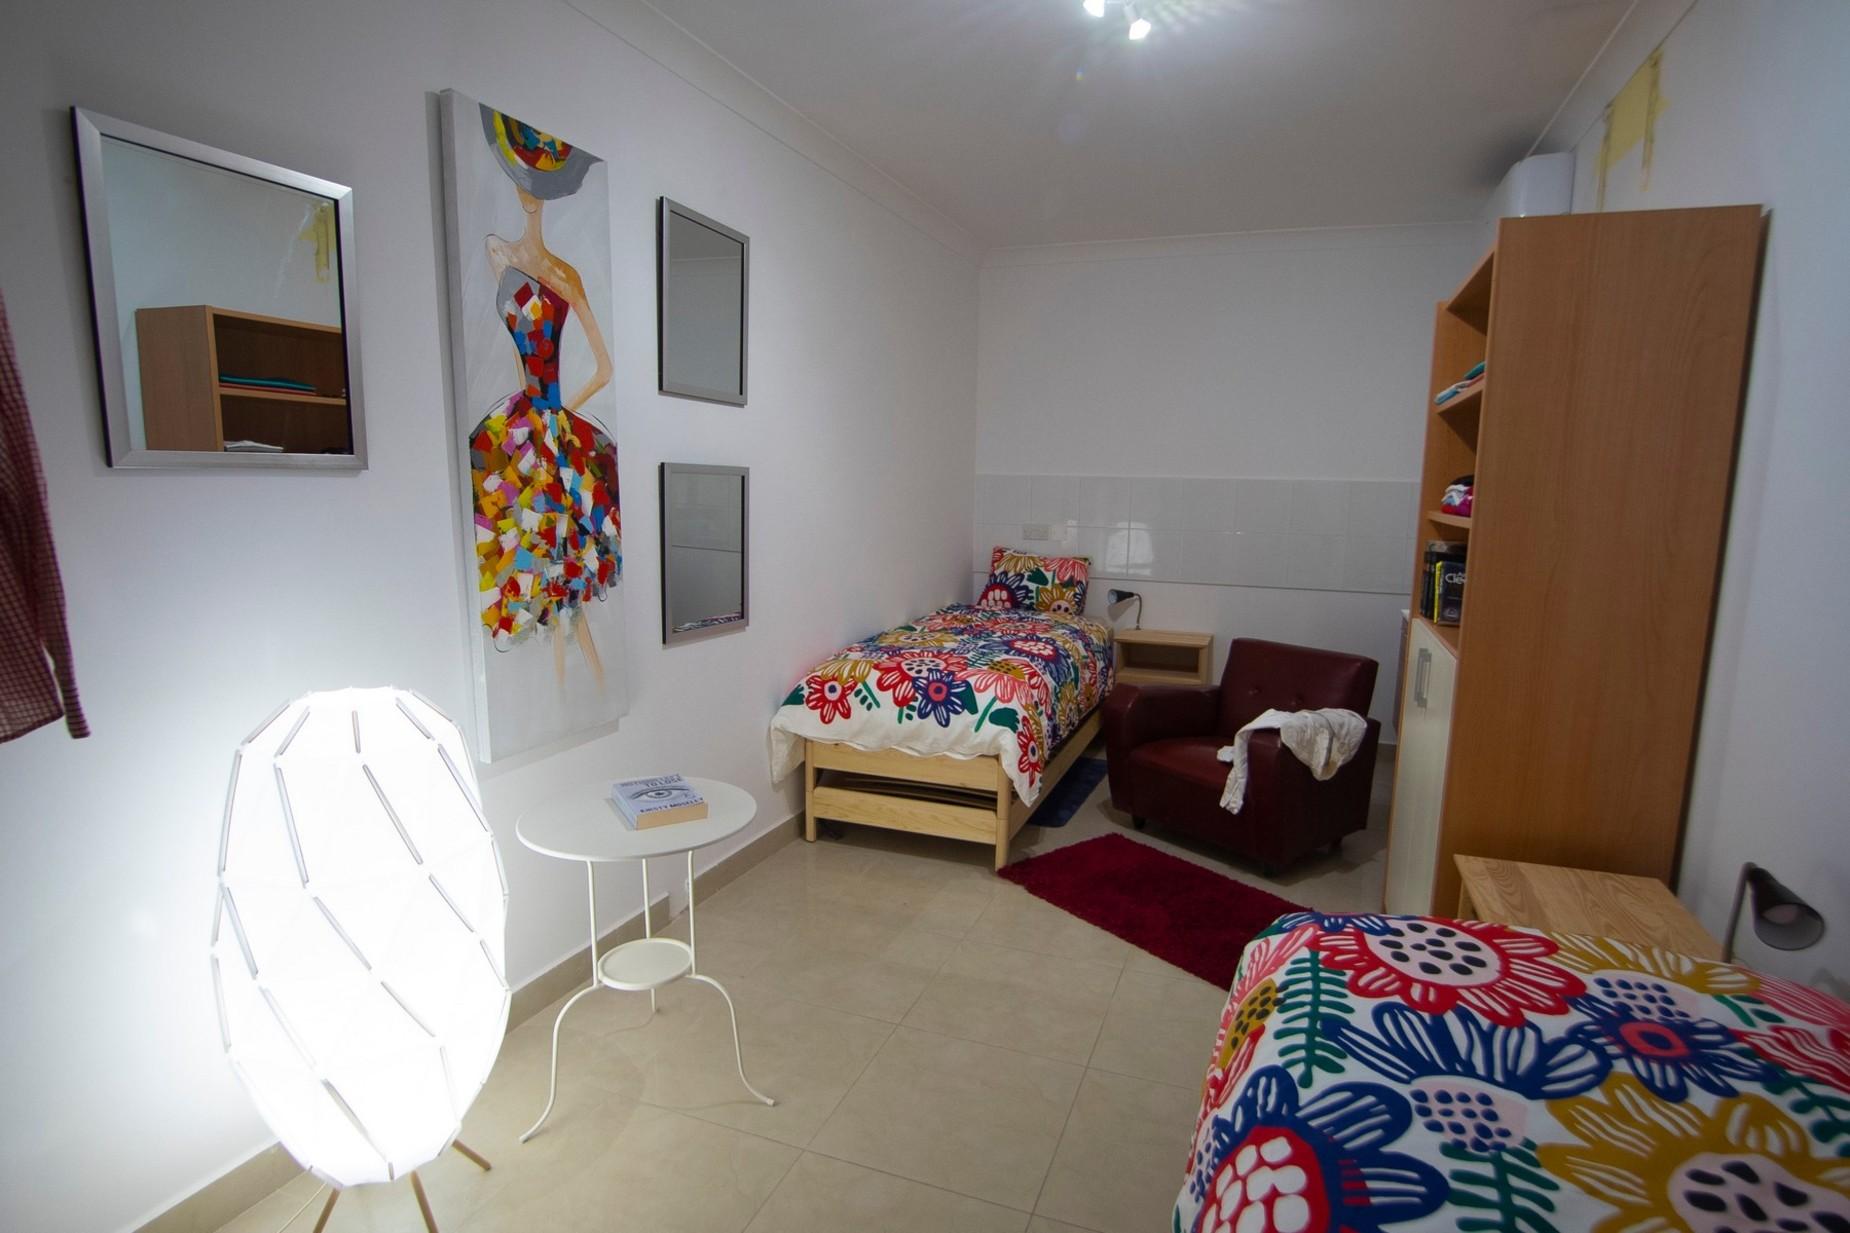 4 bed Apartment For Rent in Naxxar, Naxxar - thumb 9